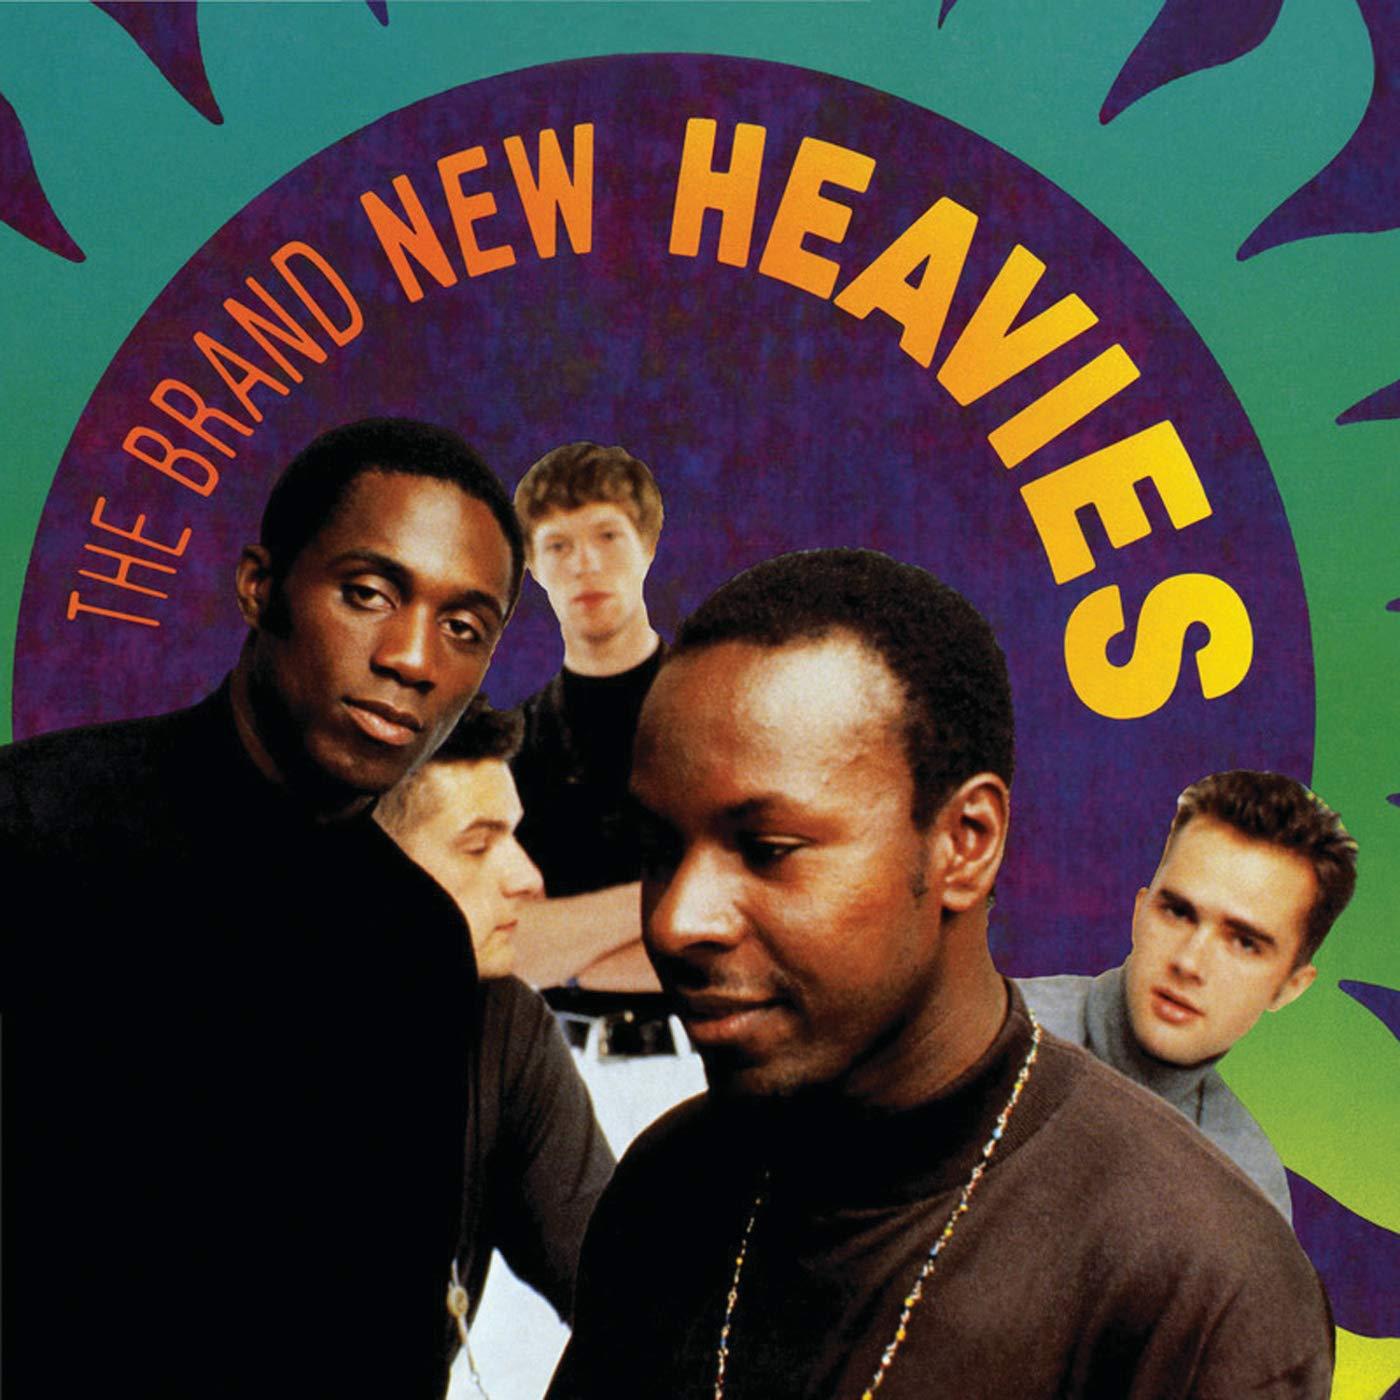 The Brand New Heavies – The Brand New Heavies (1991) [FLAC]